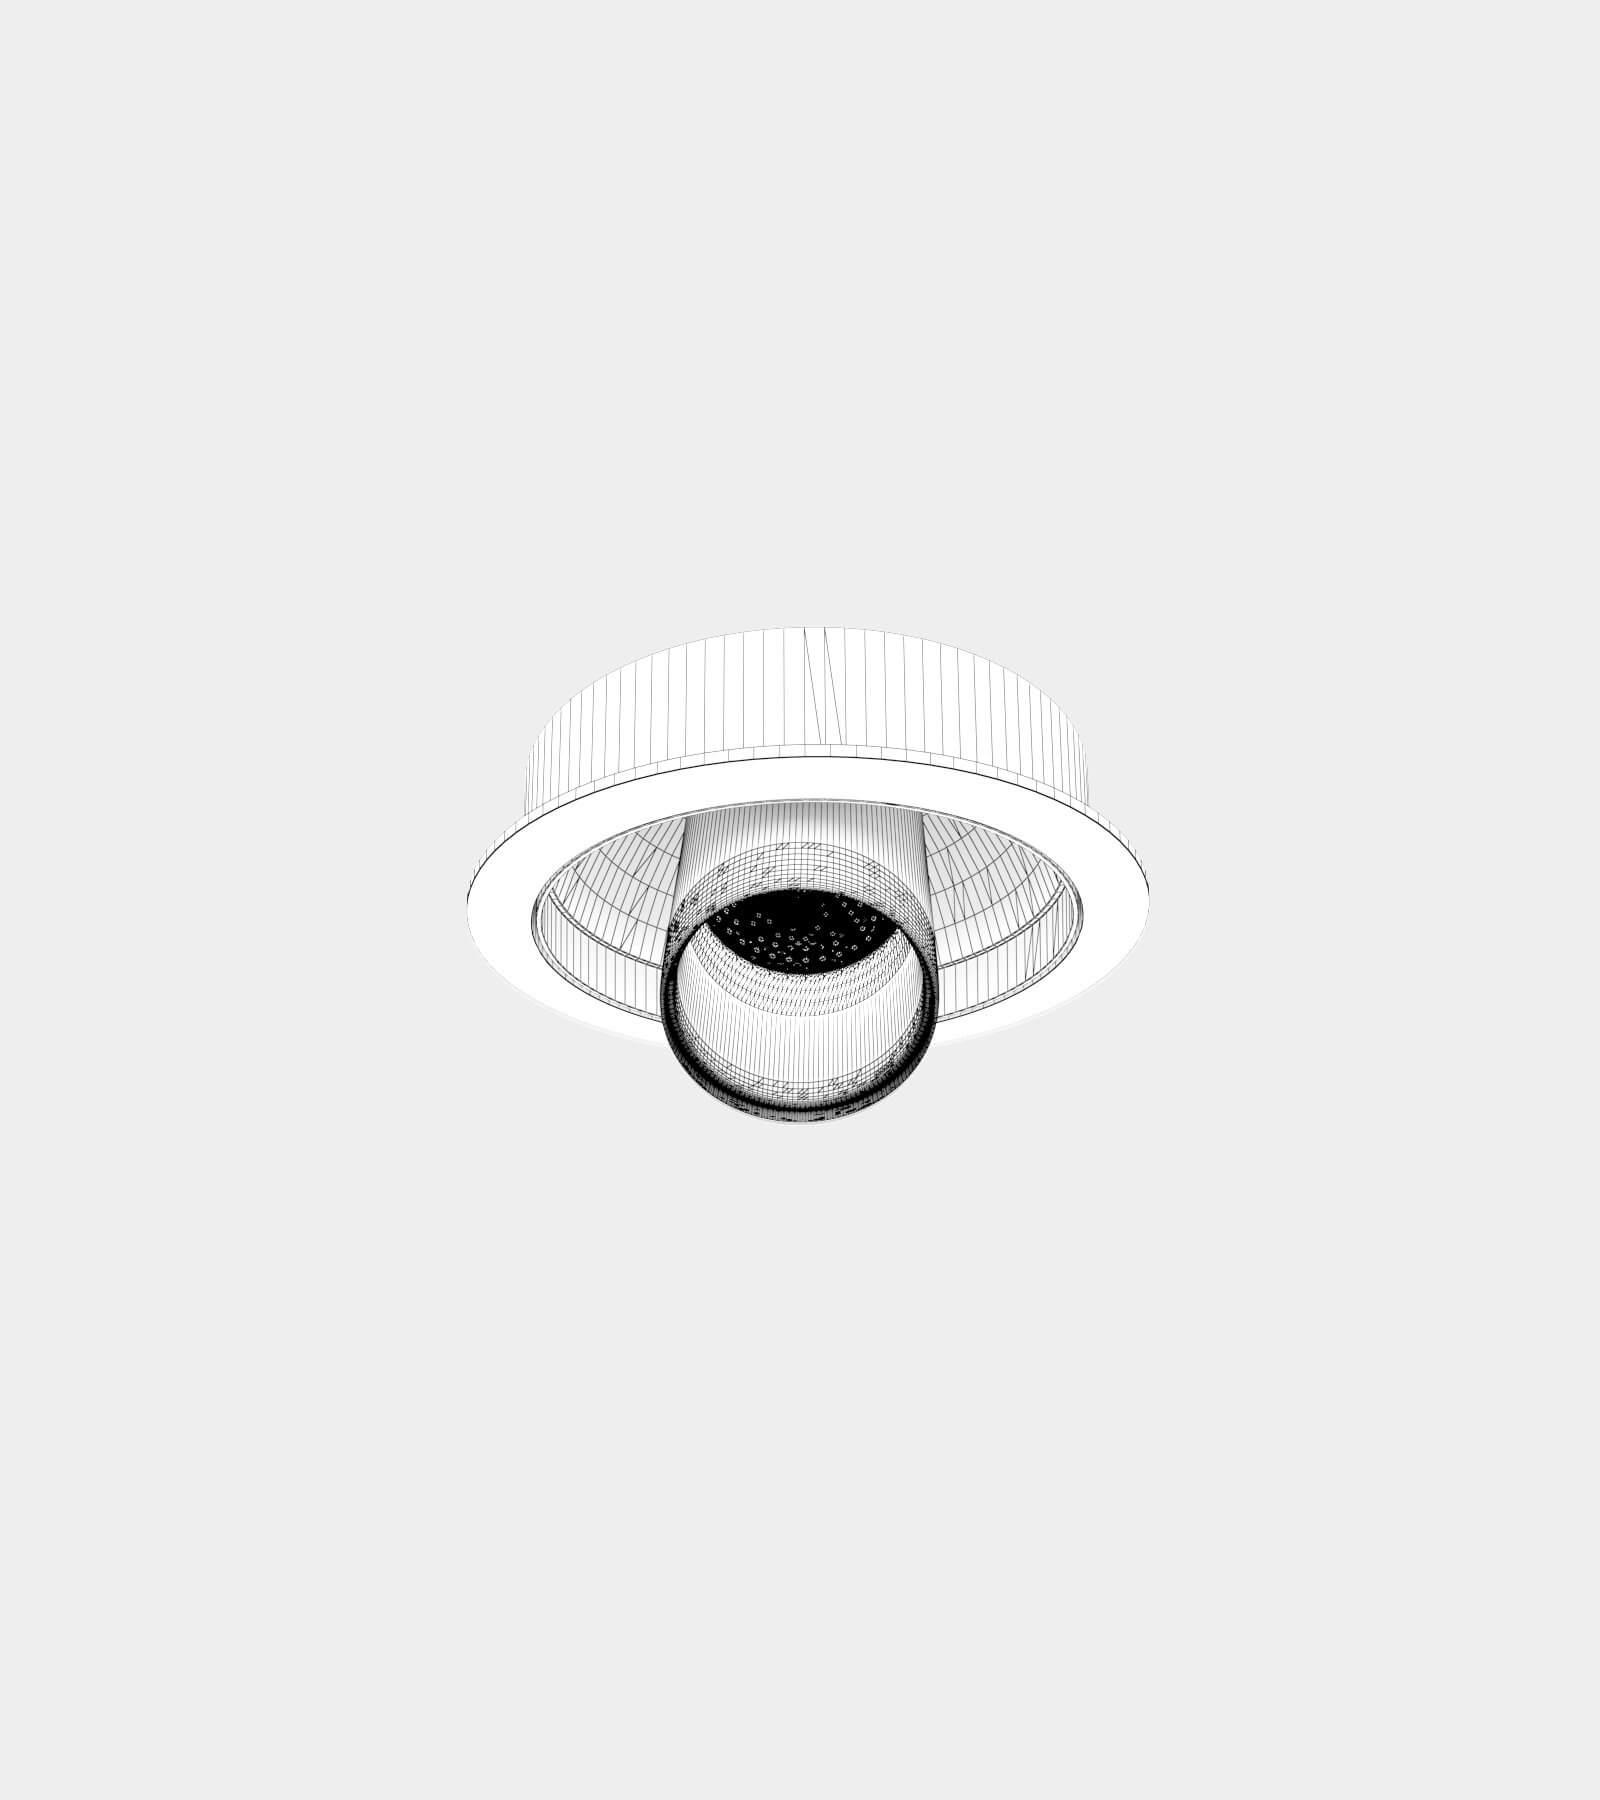 Adjustable recessed ceiling spotlights-wire-1 3D Model